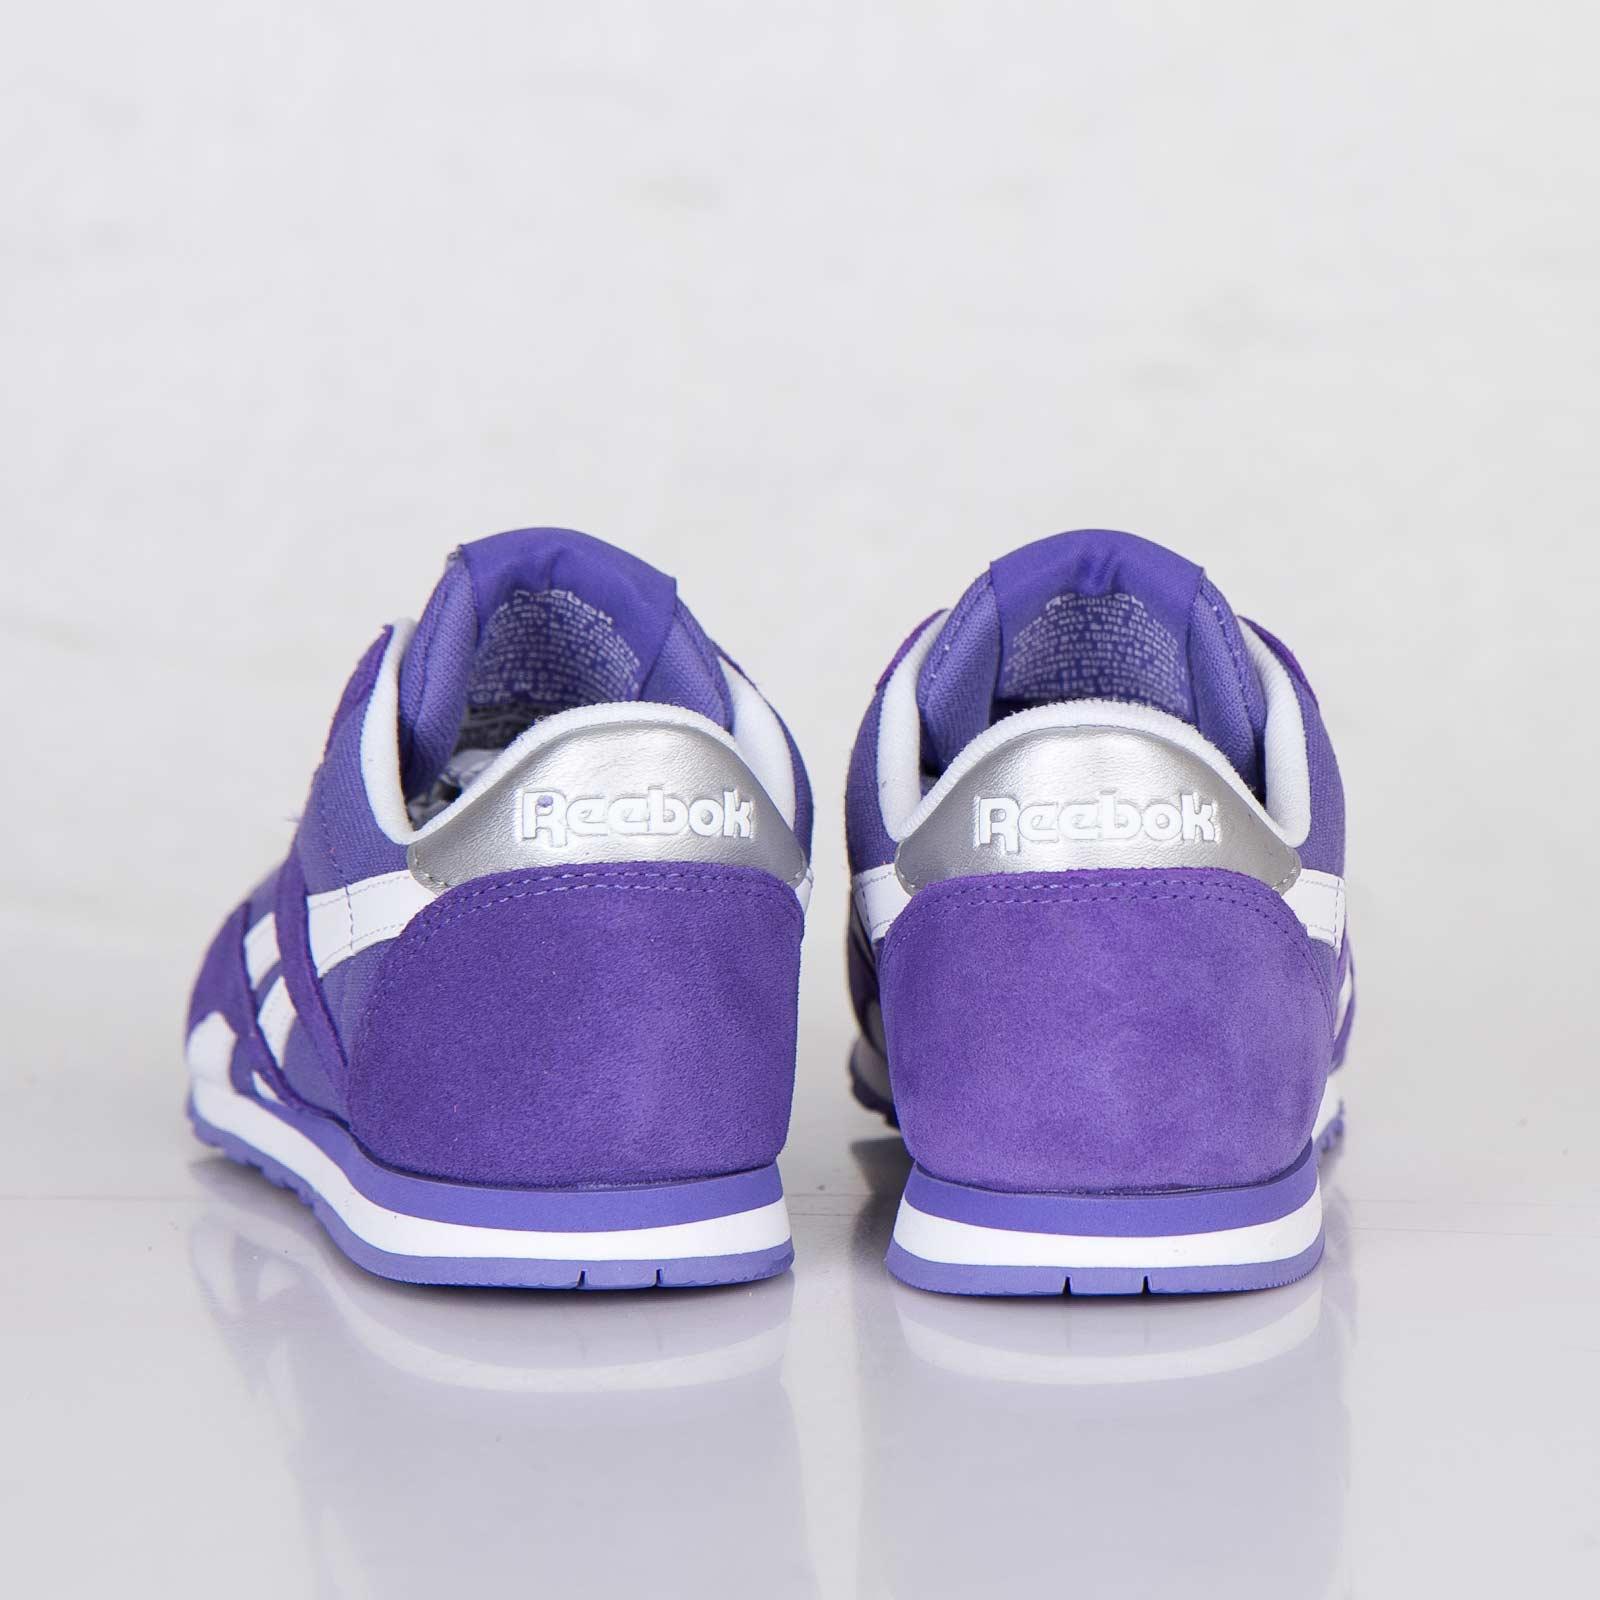 6a64940d179bf Reebok Classic Nylon Slim Pop - V59396 - Sneakersnstuff